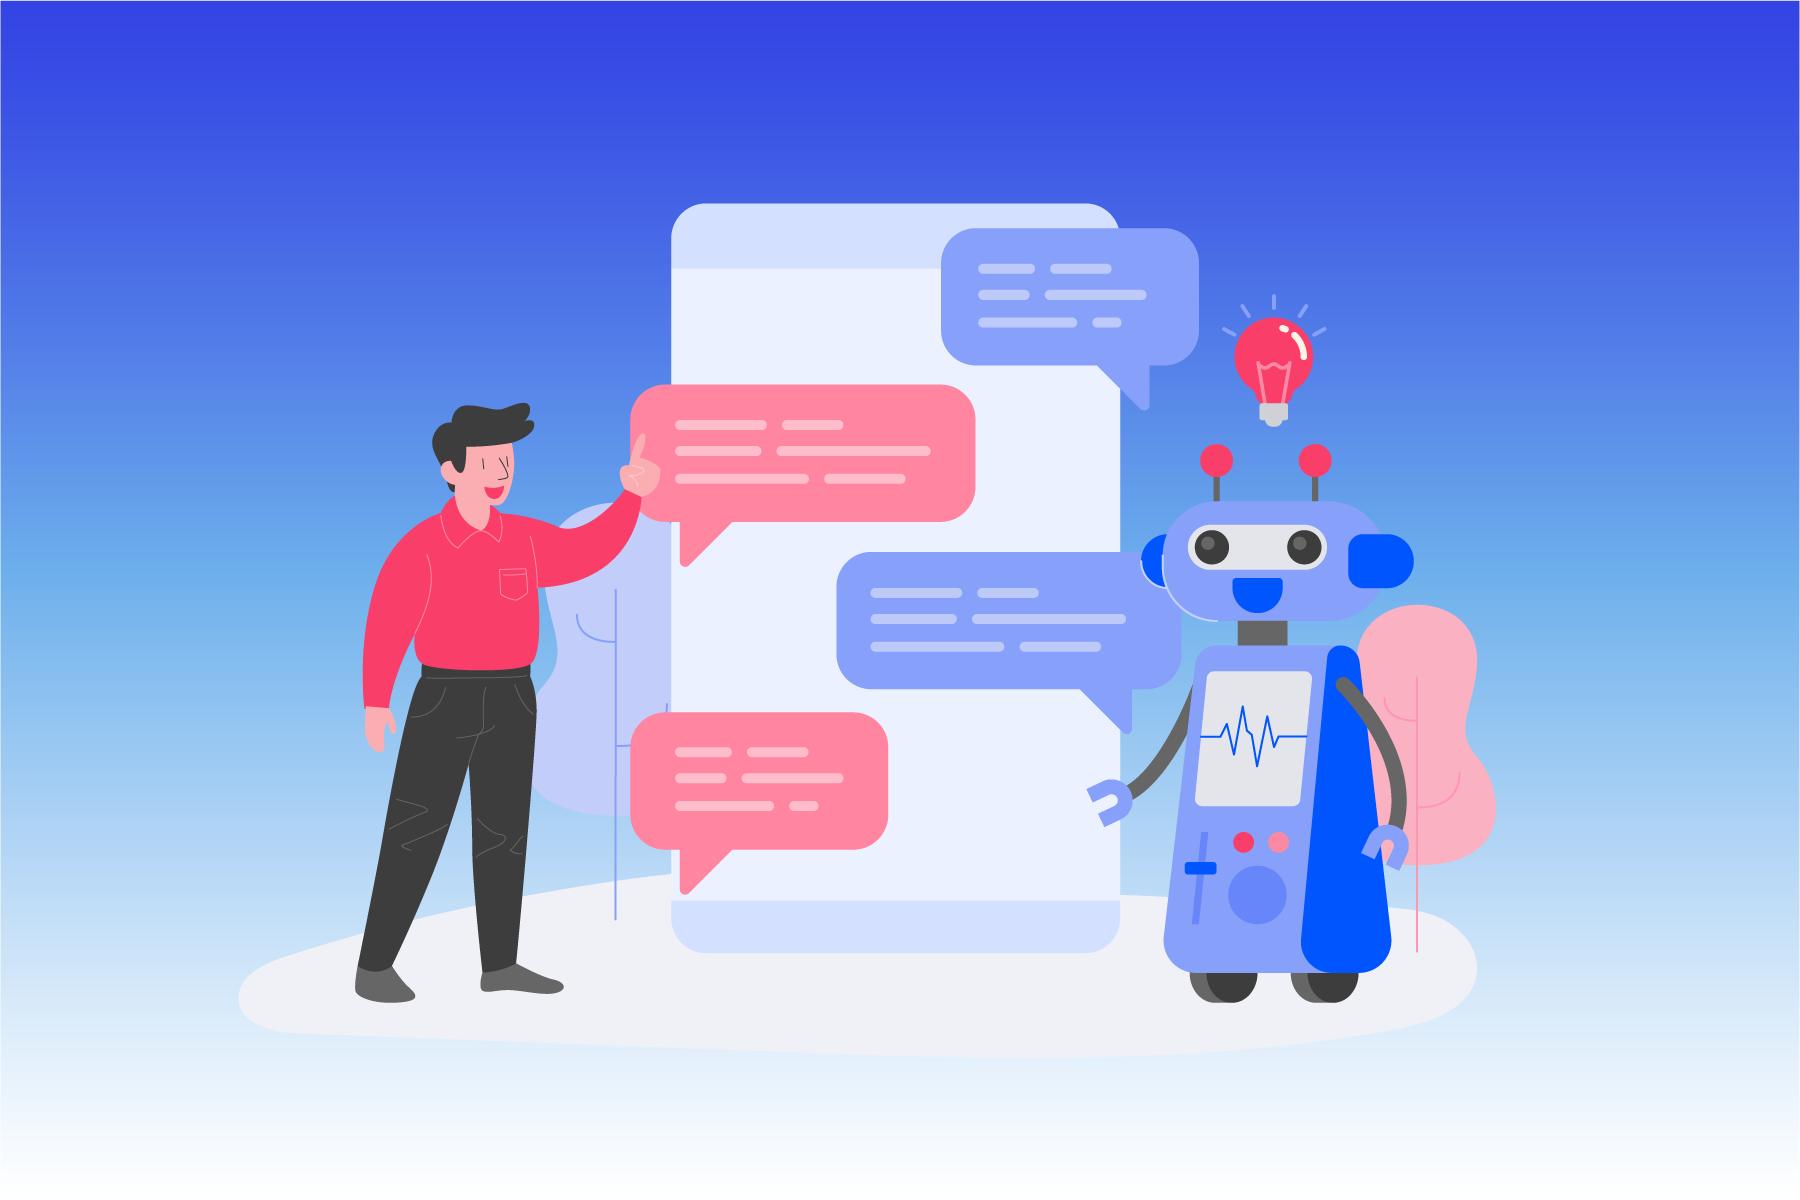 chatbot flat illustration